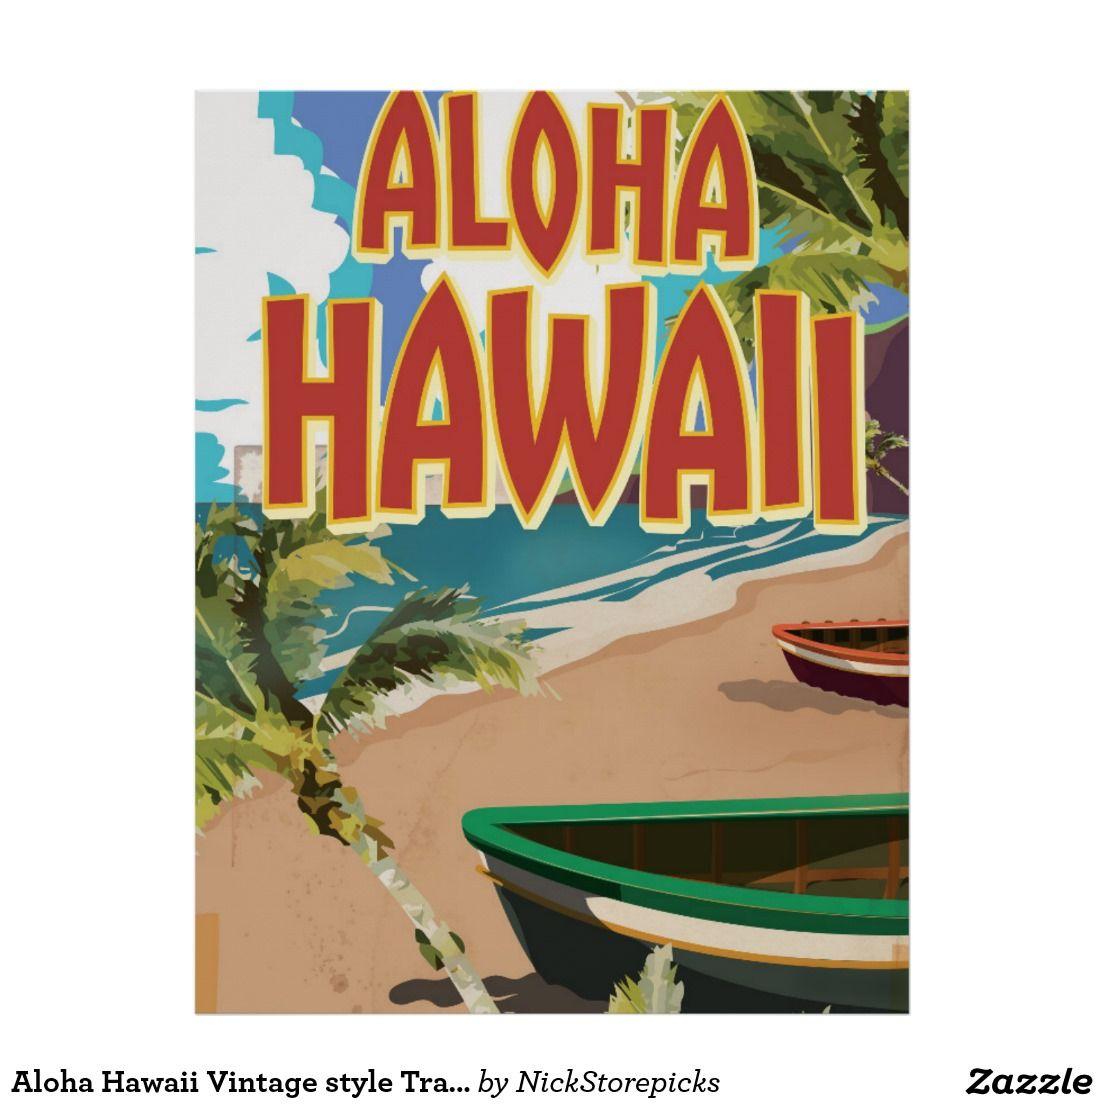 aloha hawaii vintage style travel